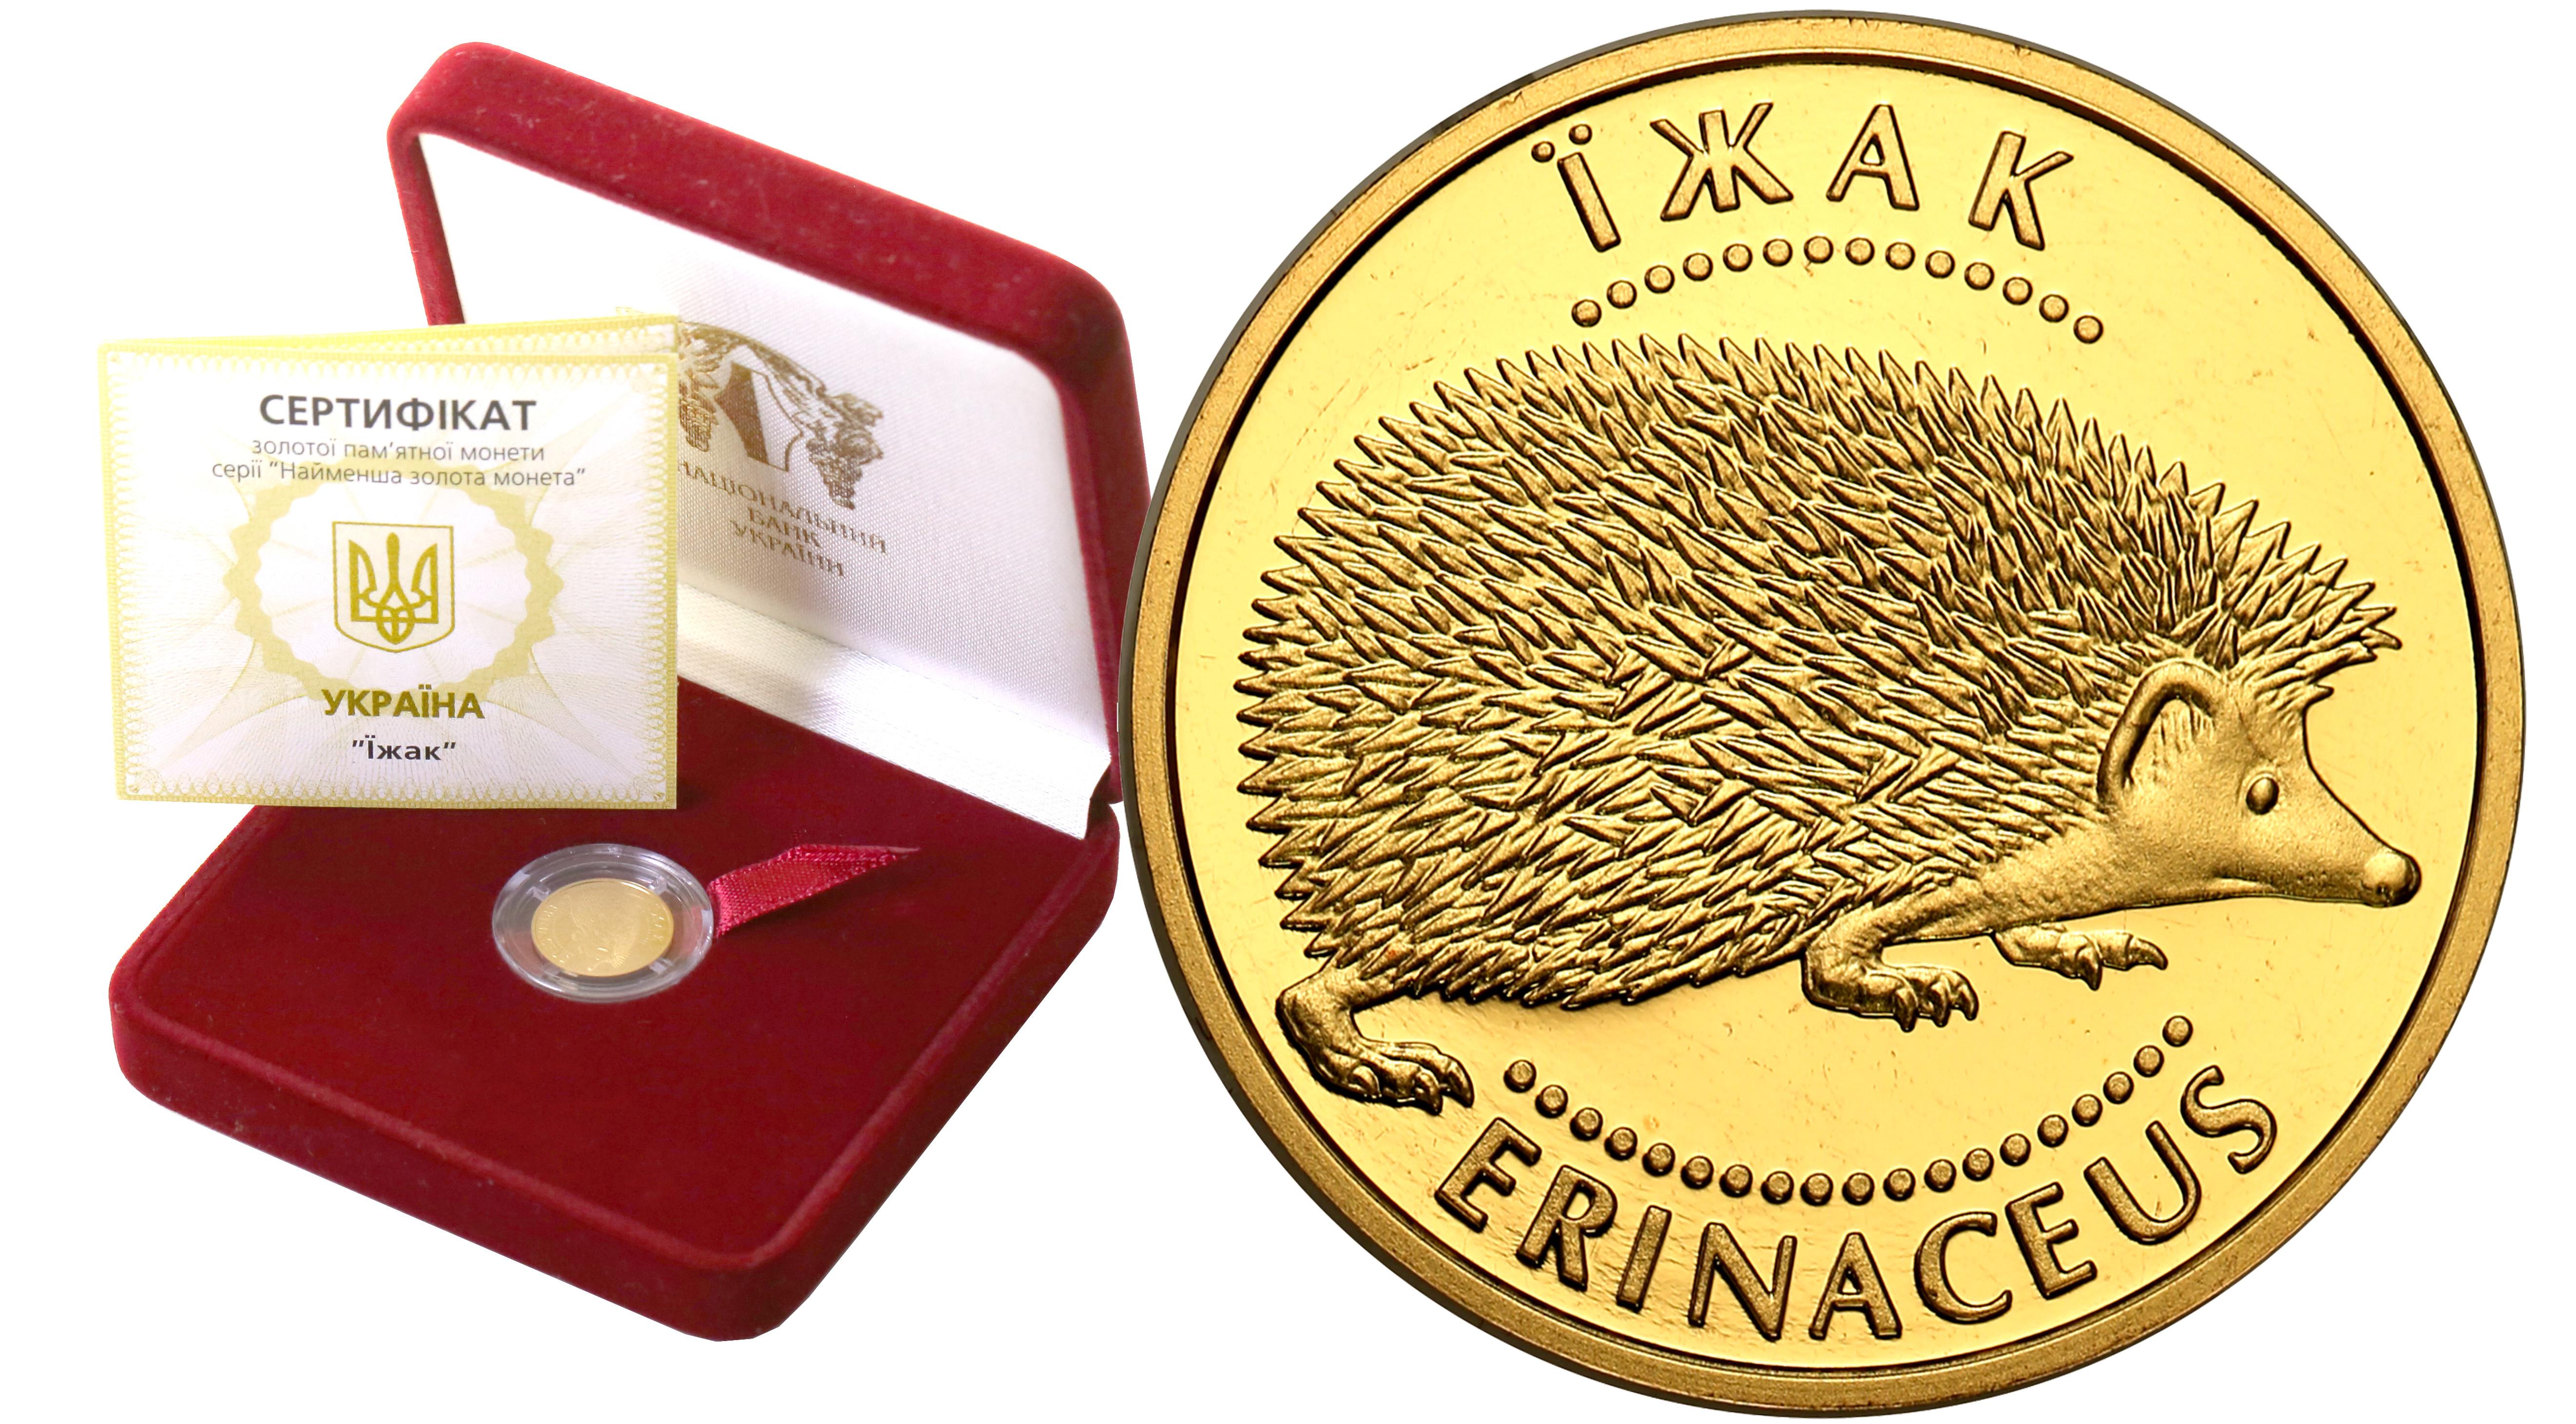 Ukraina 2 hrywny 2006 Jeż 1/25 uncji czystego złota st. L